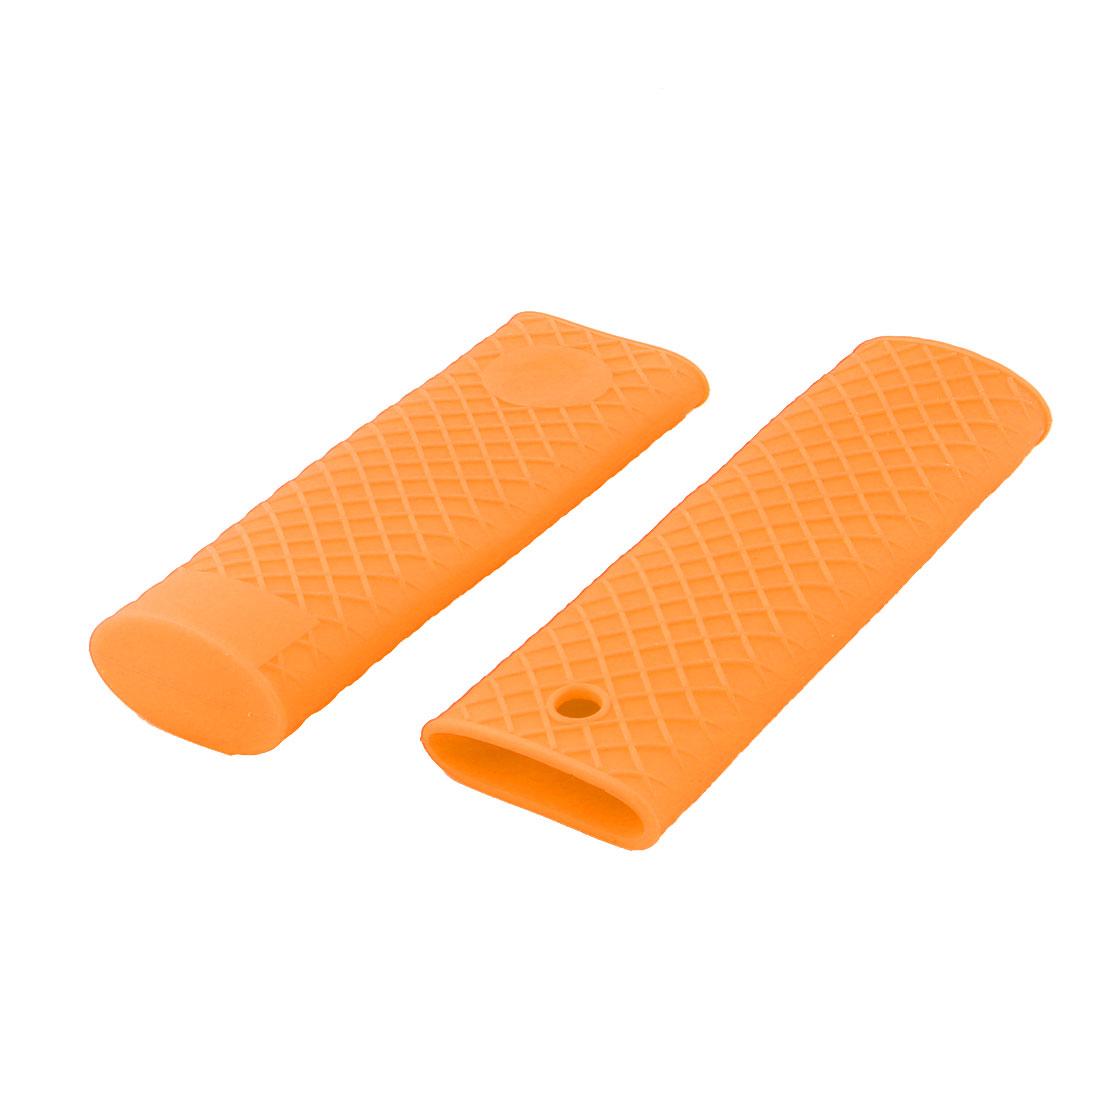 Home Silicone Heat Resistant Pot Pan Stockpot Handle Sleeve Cover Orange 2pcs